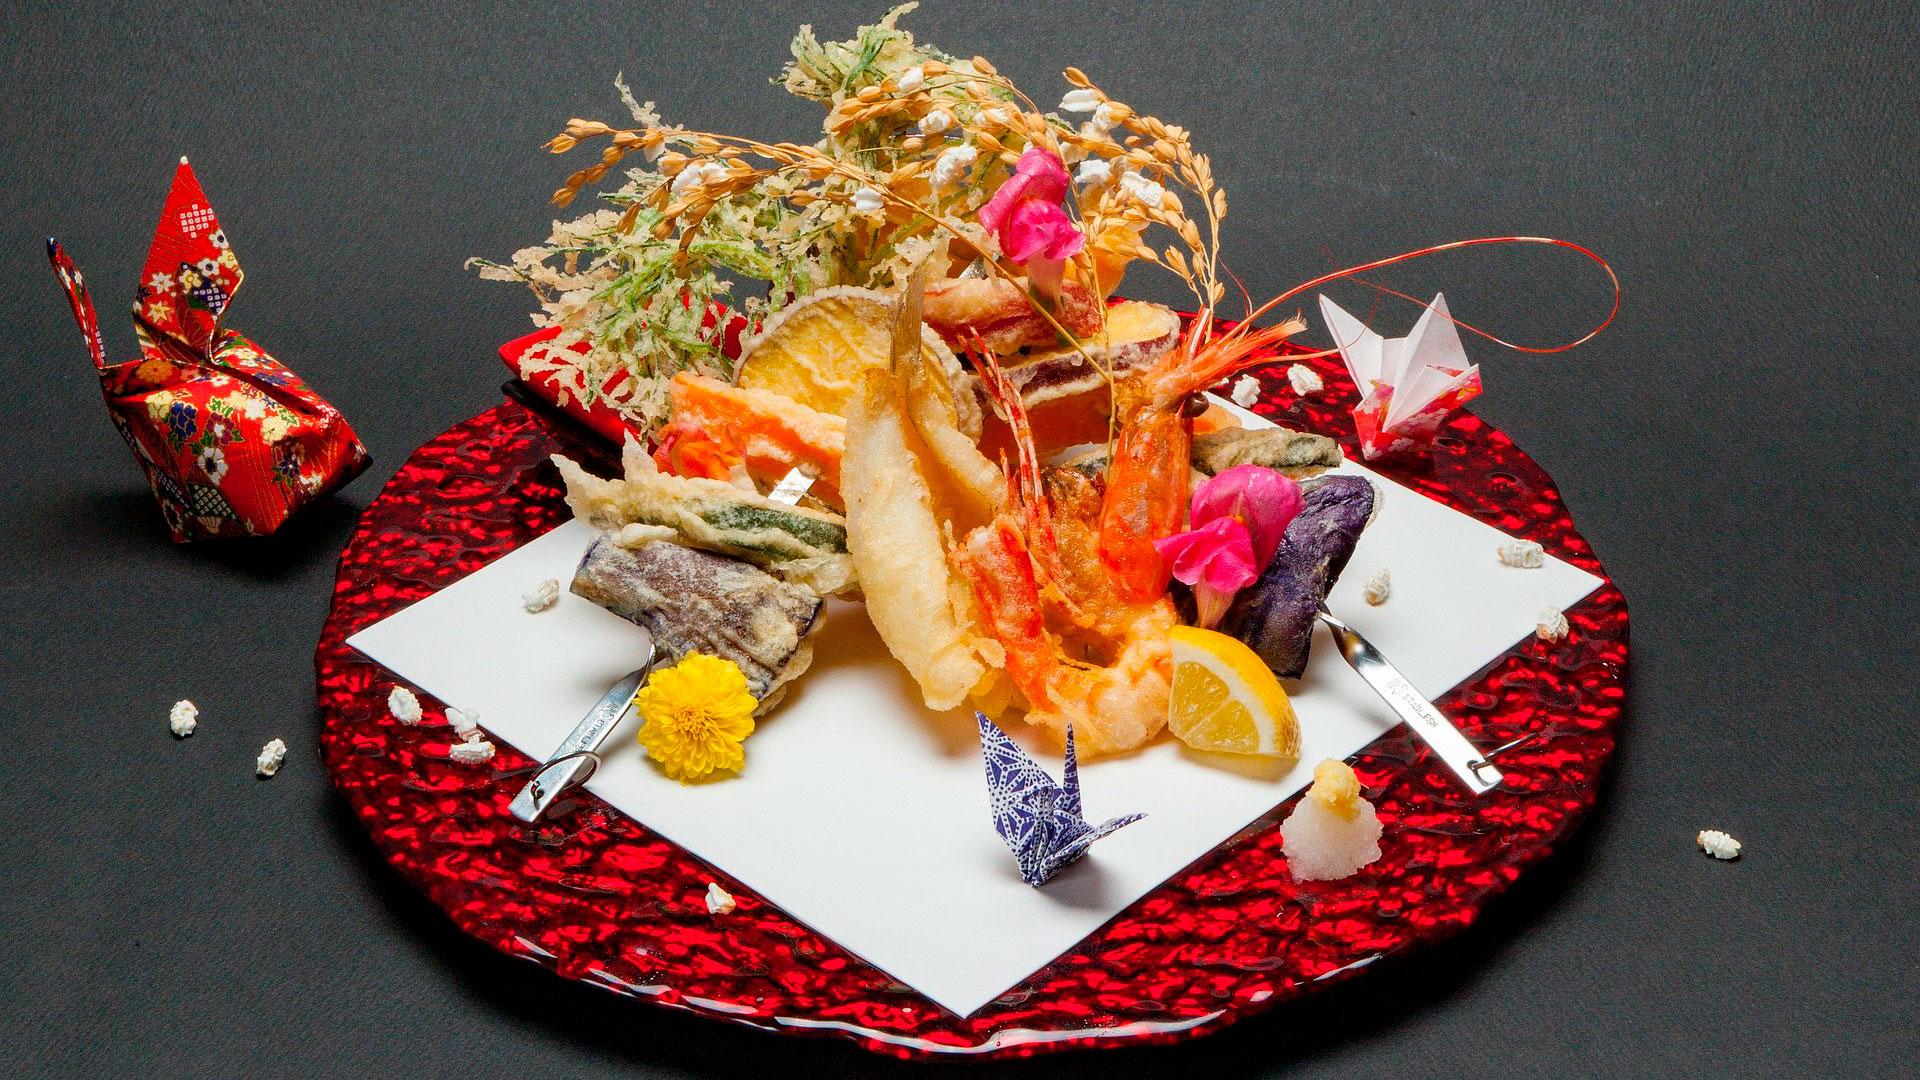 Imagen de un plato de comida japonés